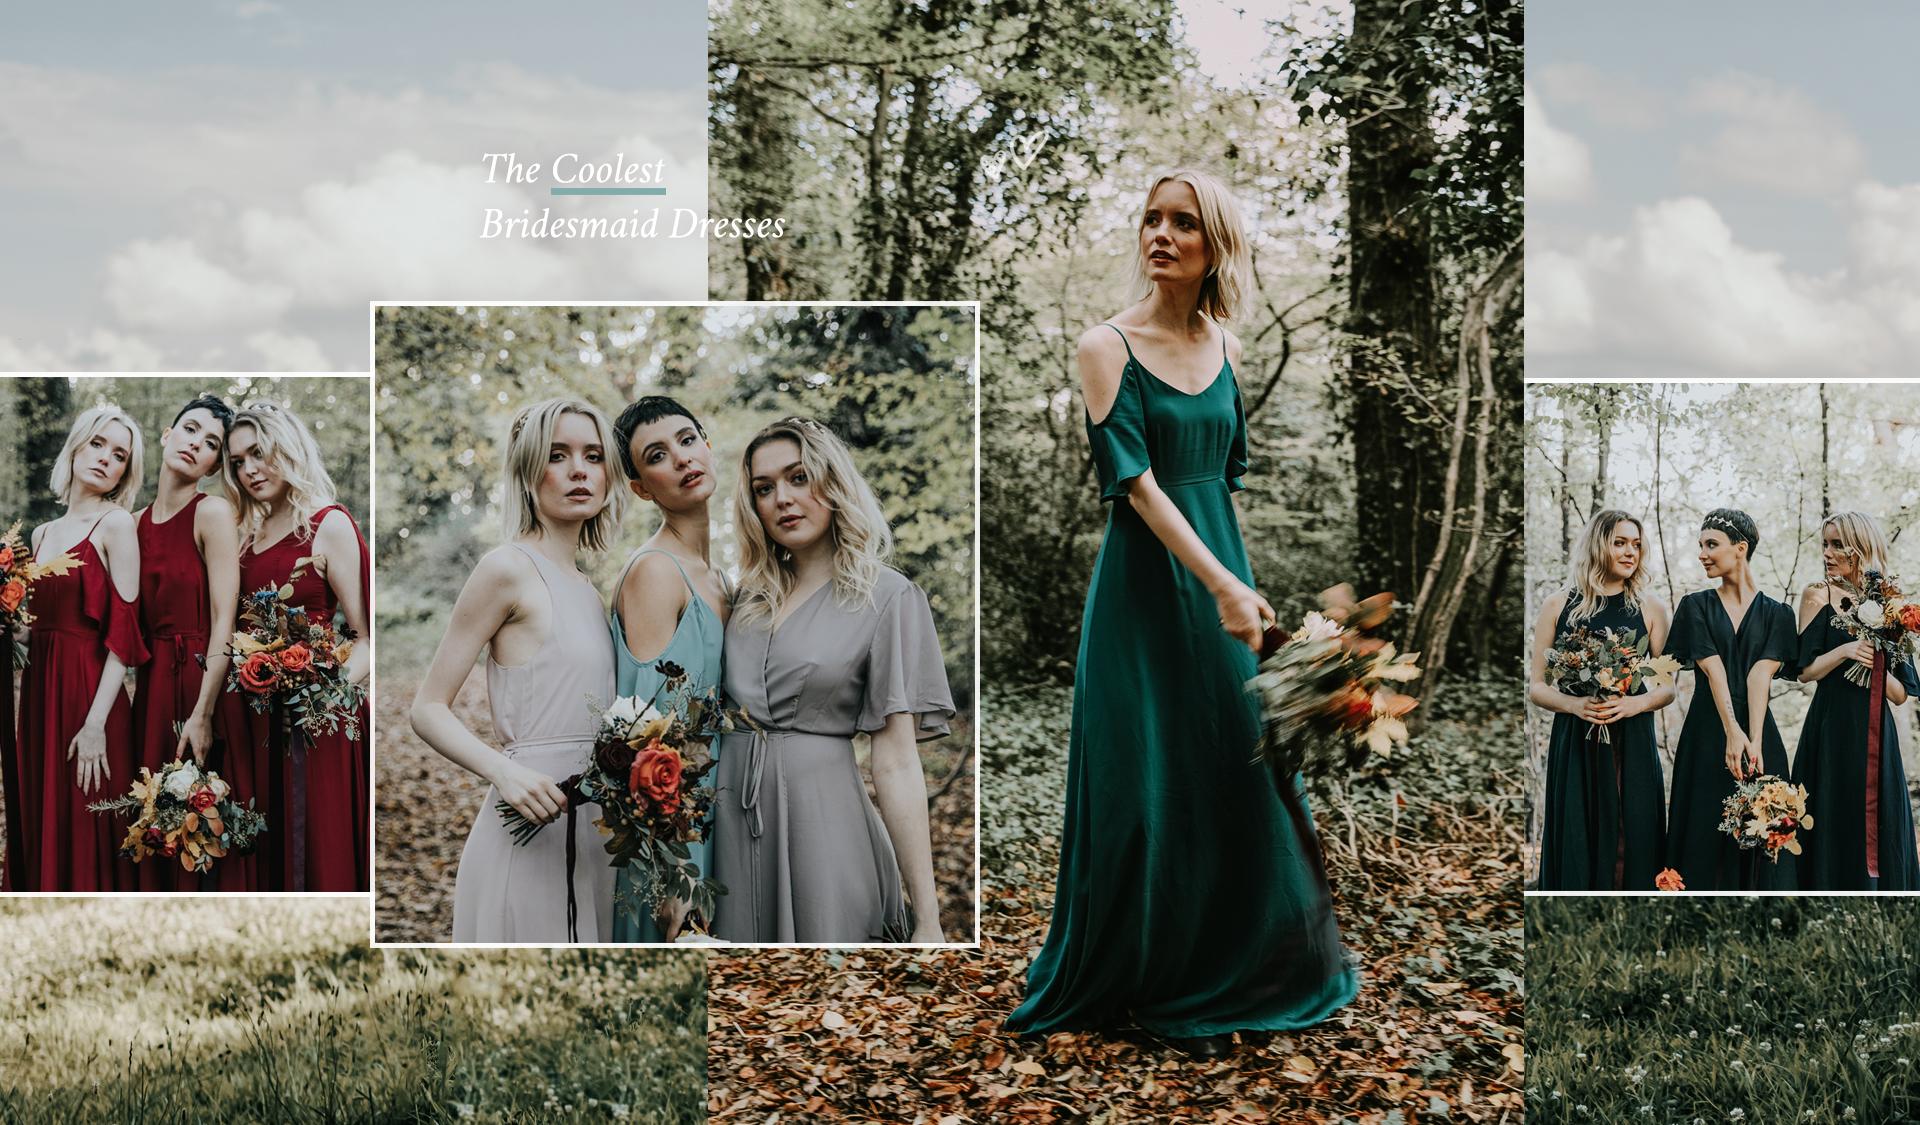 Cool Modern Bridesmaid Dresses